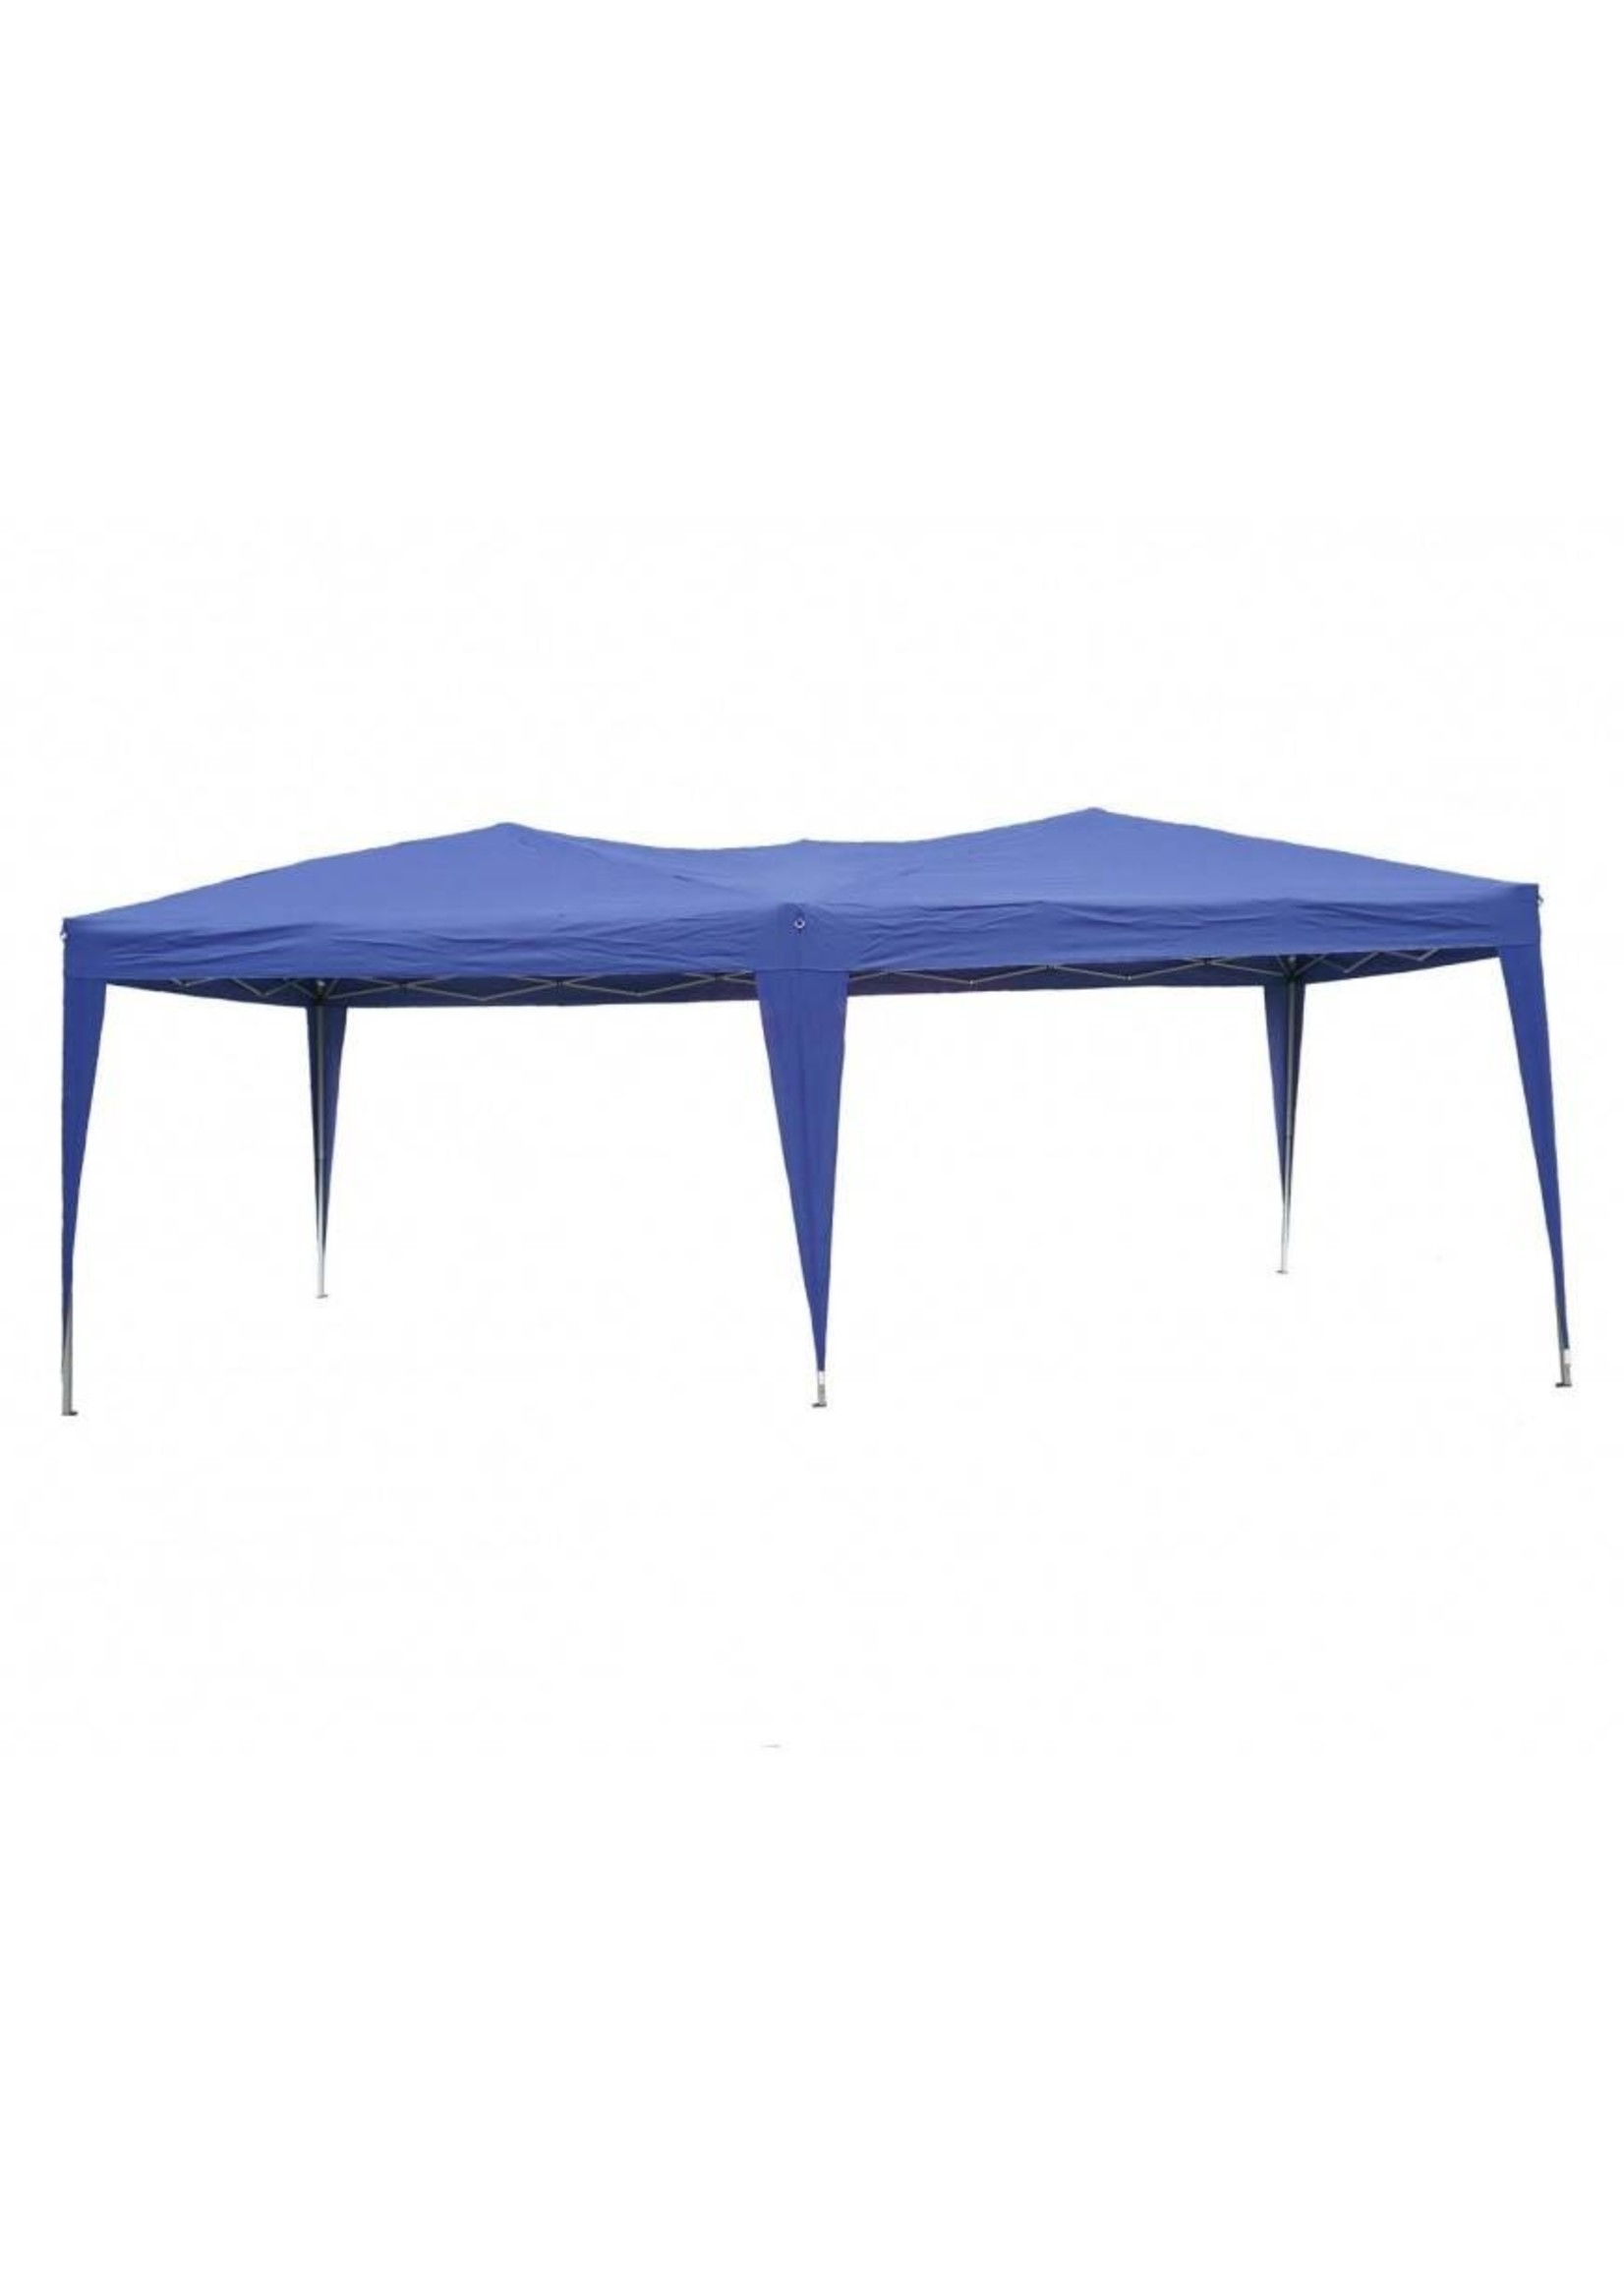 Garden Royal Garden Royal Partytent Easy Up 3x6m opvouwbaar blauw